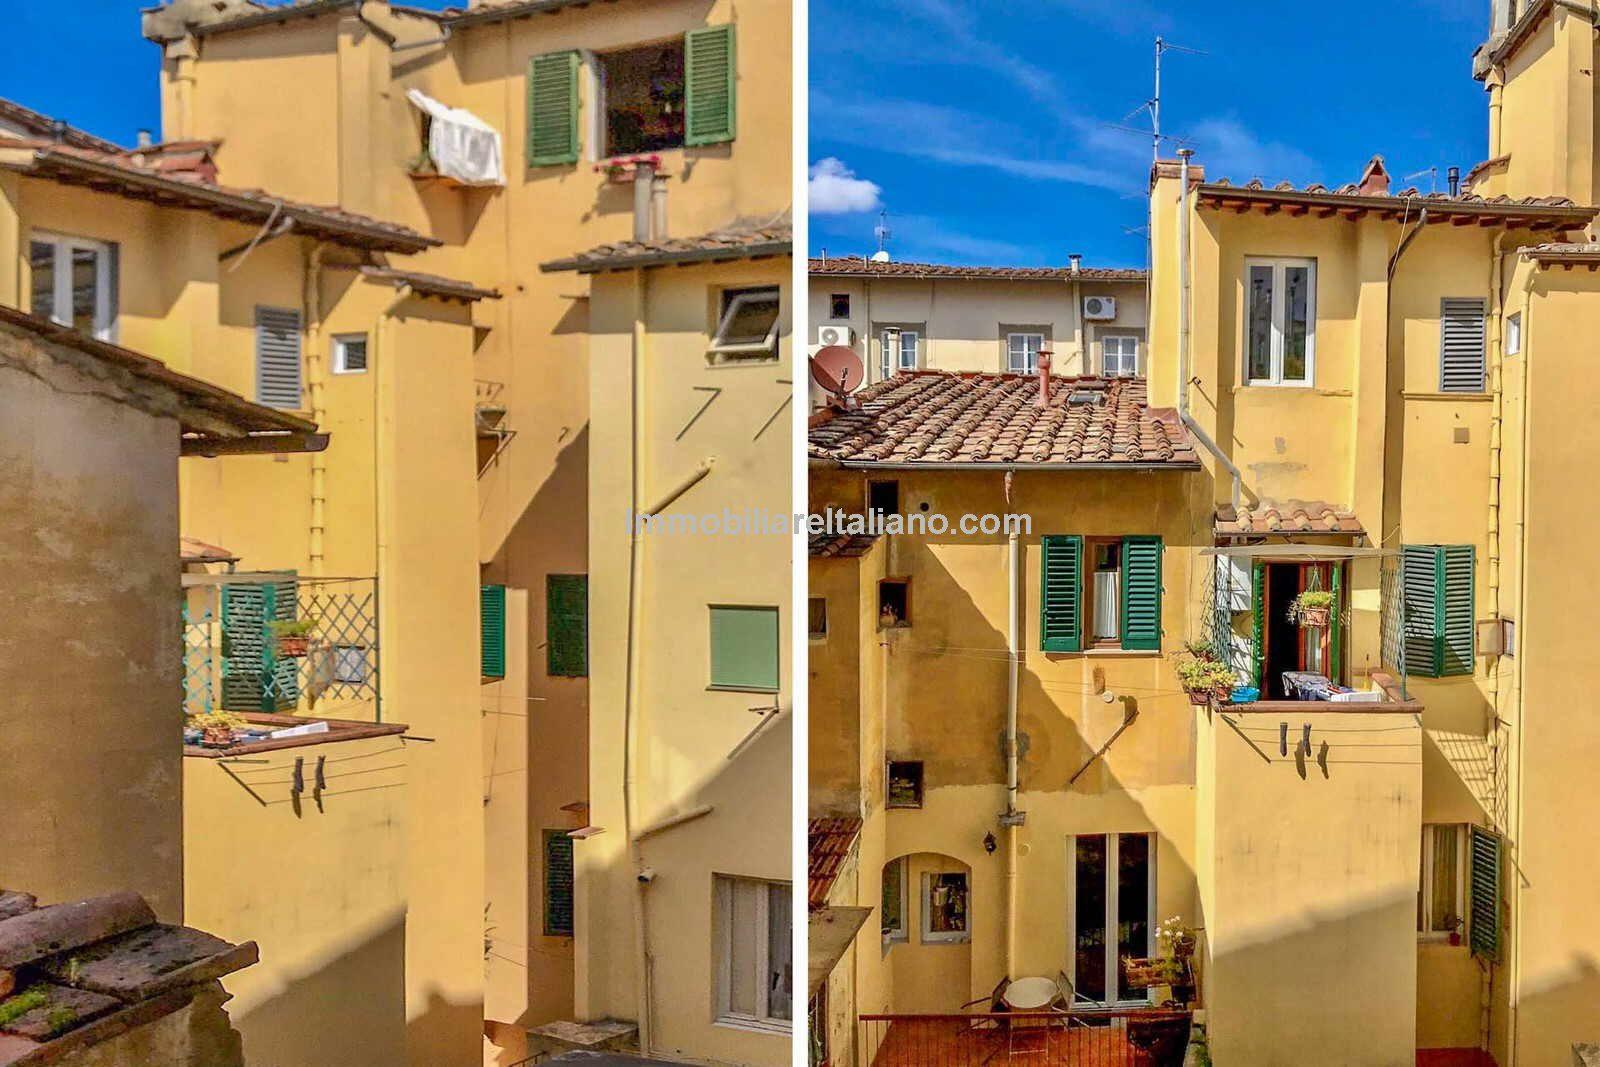 2 Bedroom Apartment in Florence Immobiliare Italiano